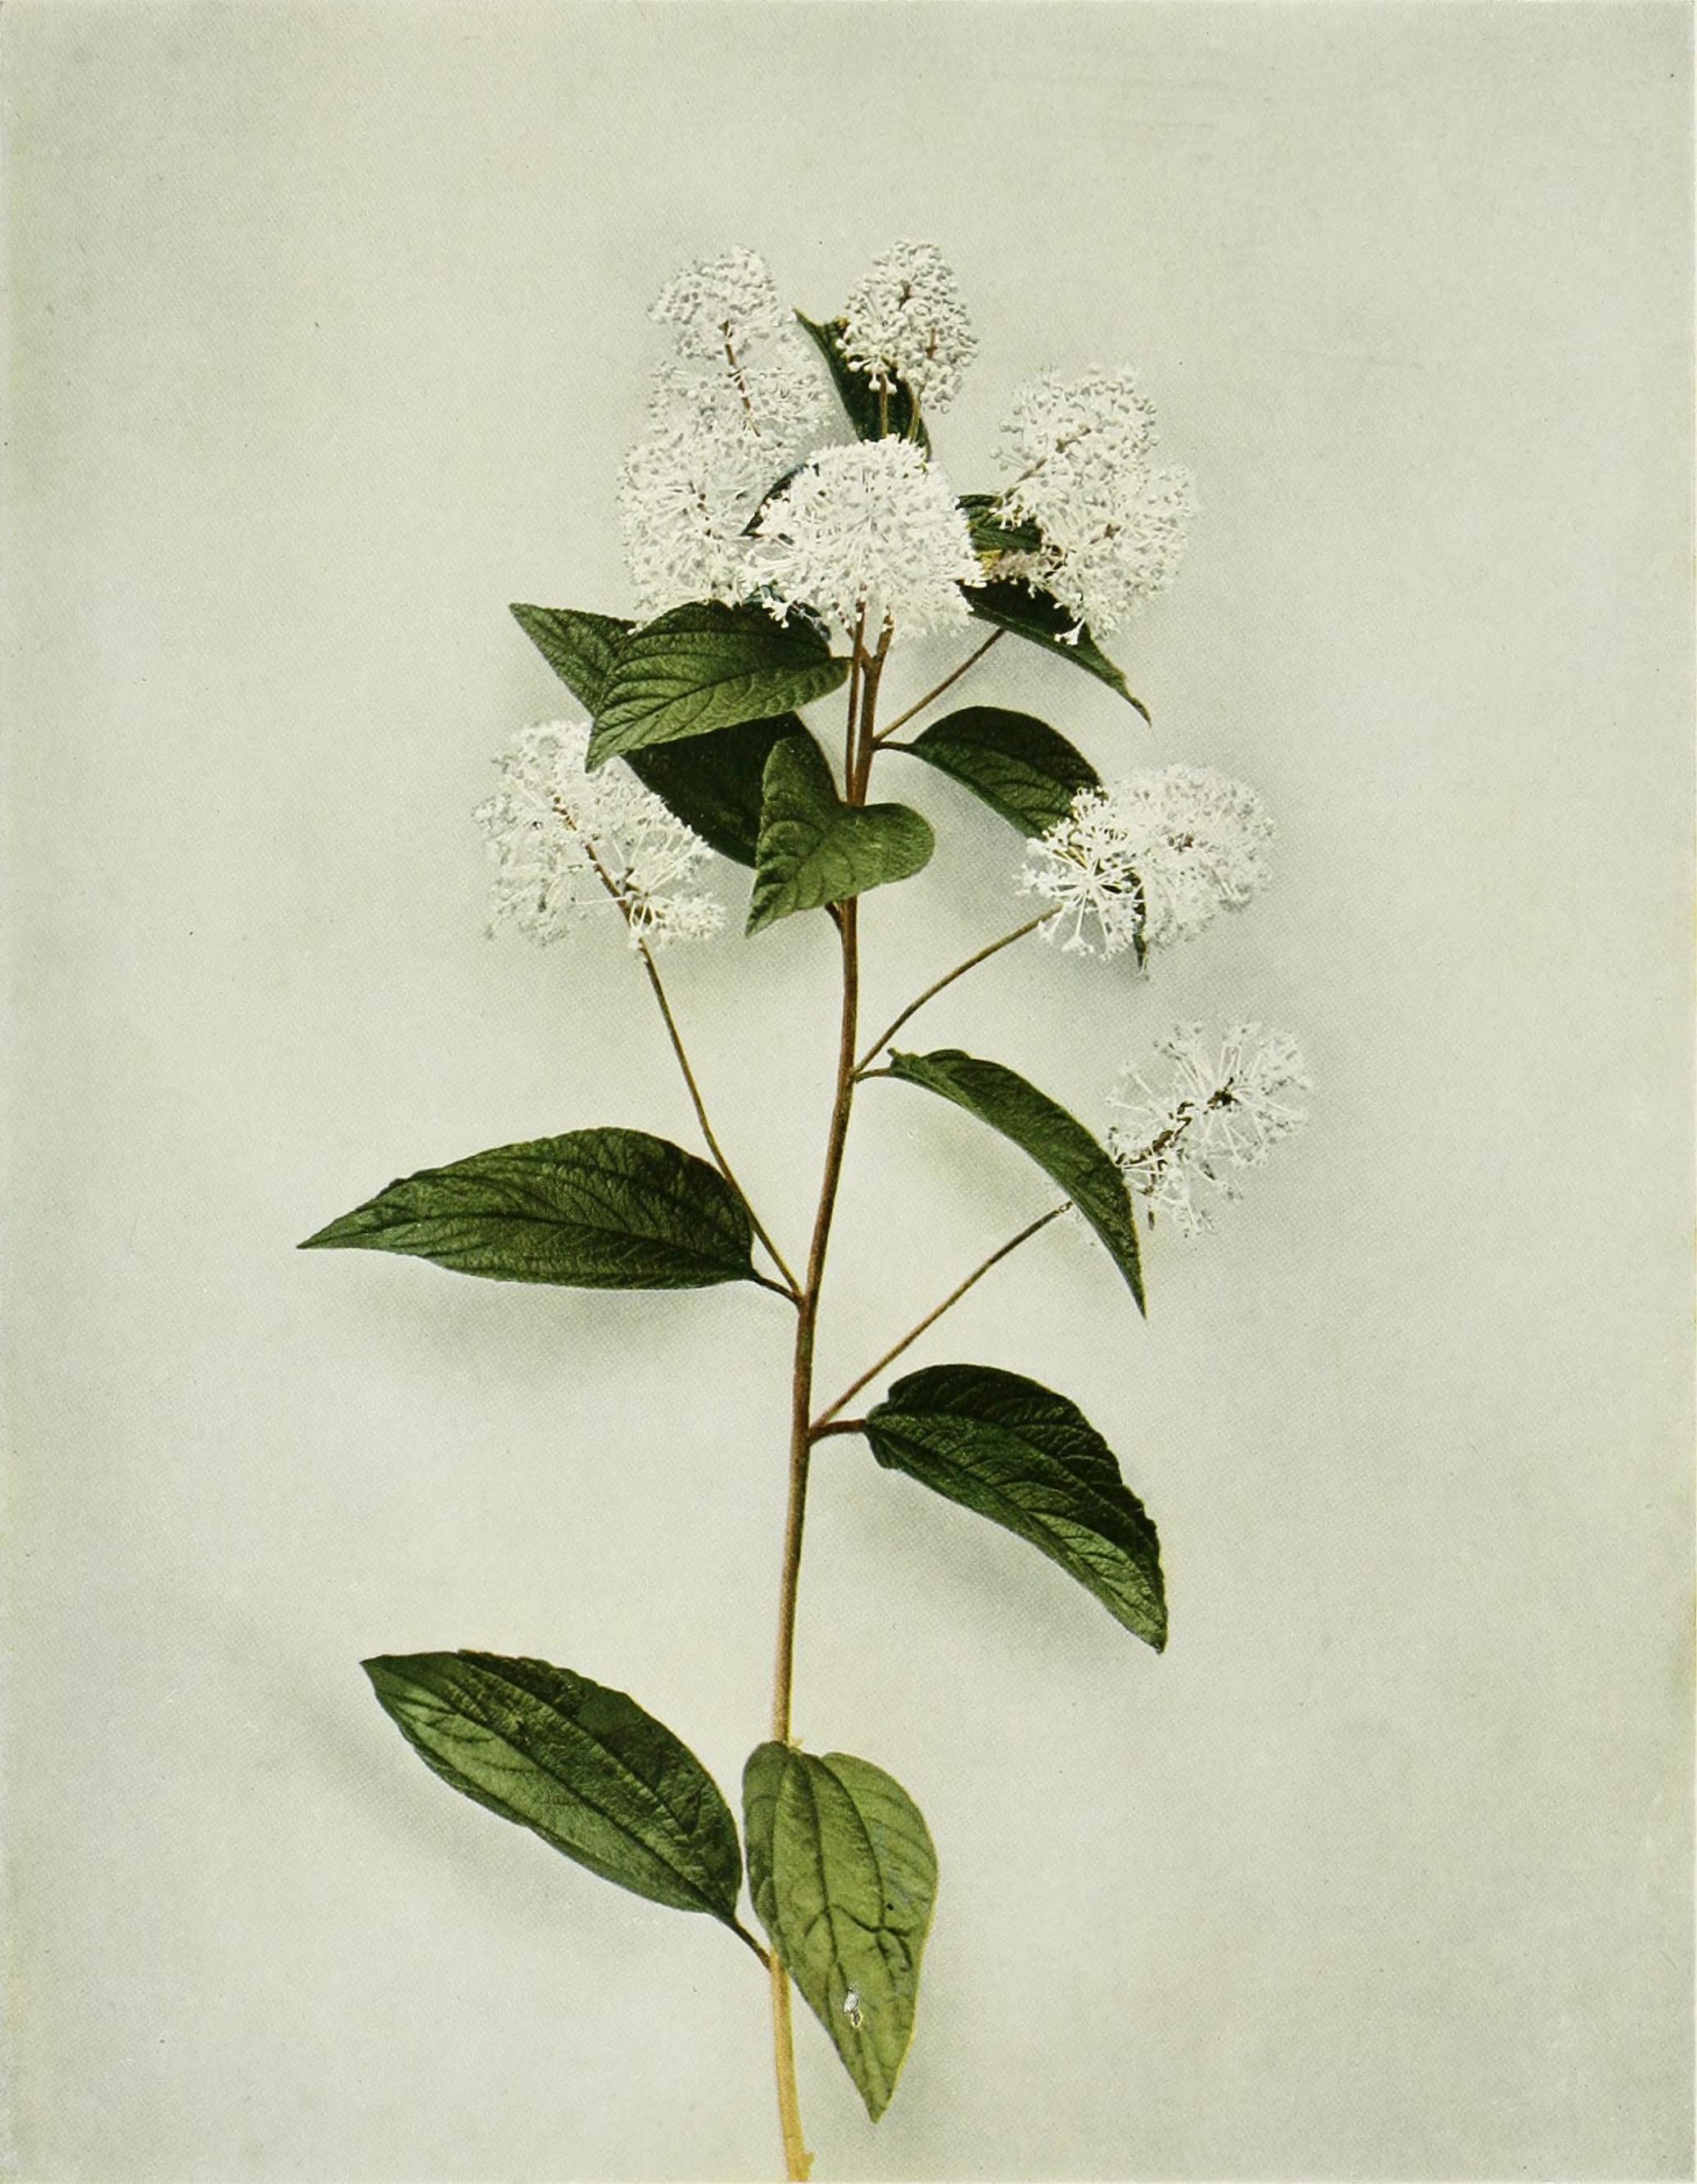 Ceanothus_americanus_WFNY-126_(17804947124).jpg